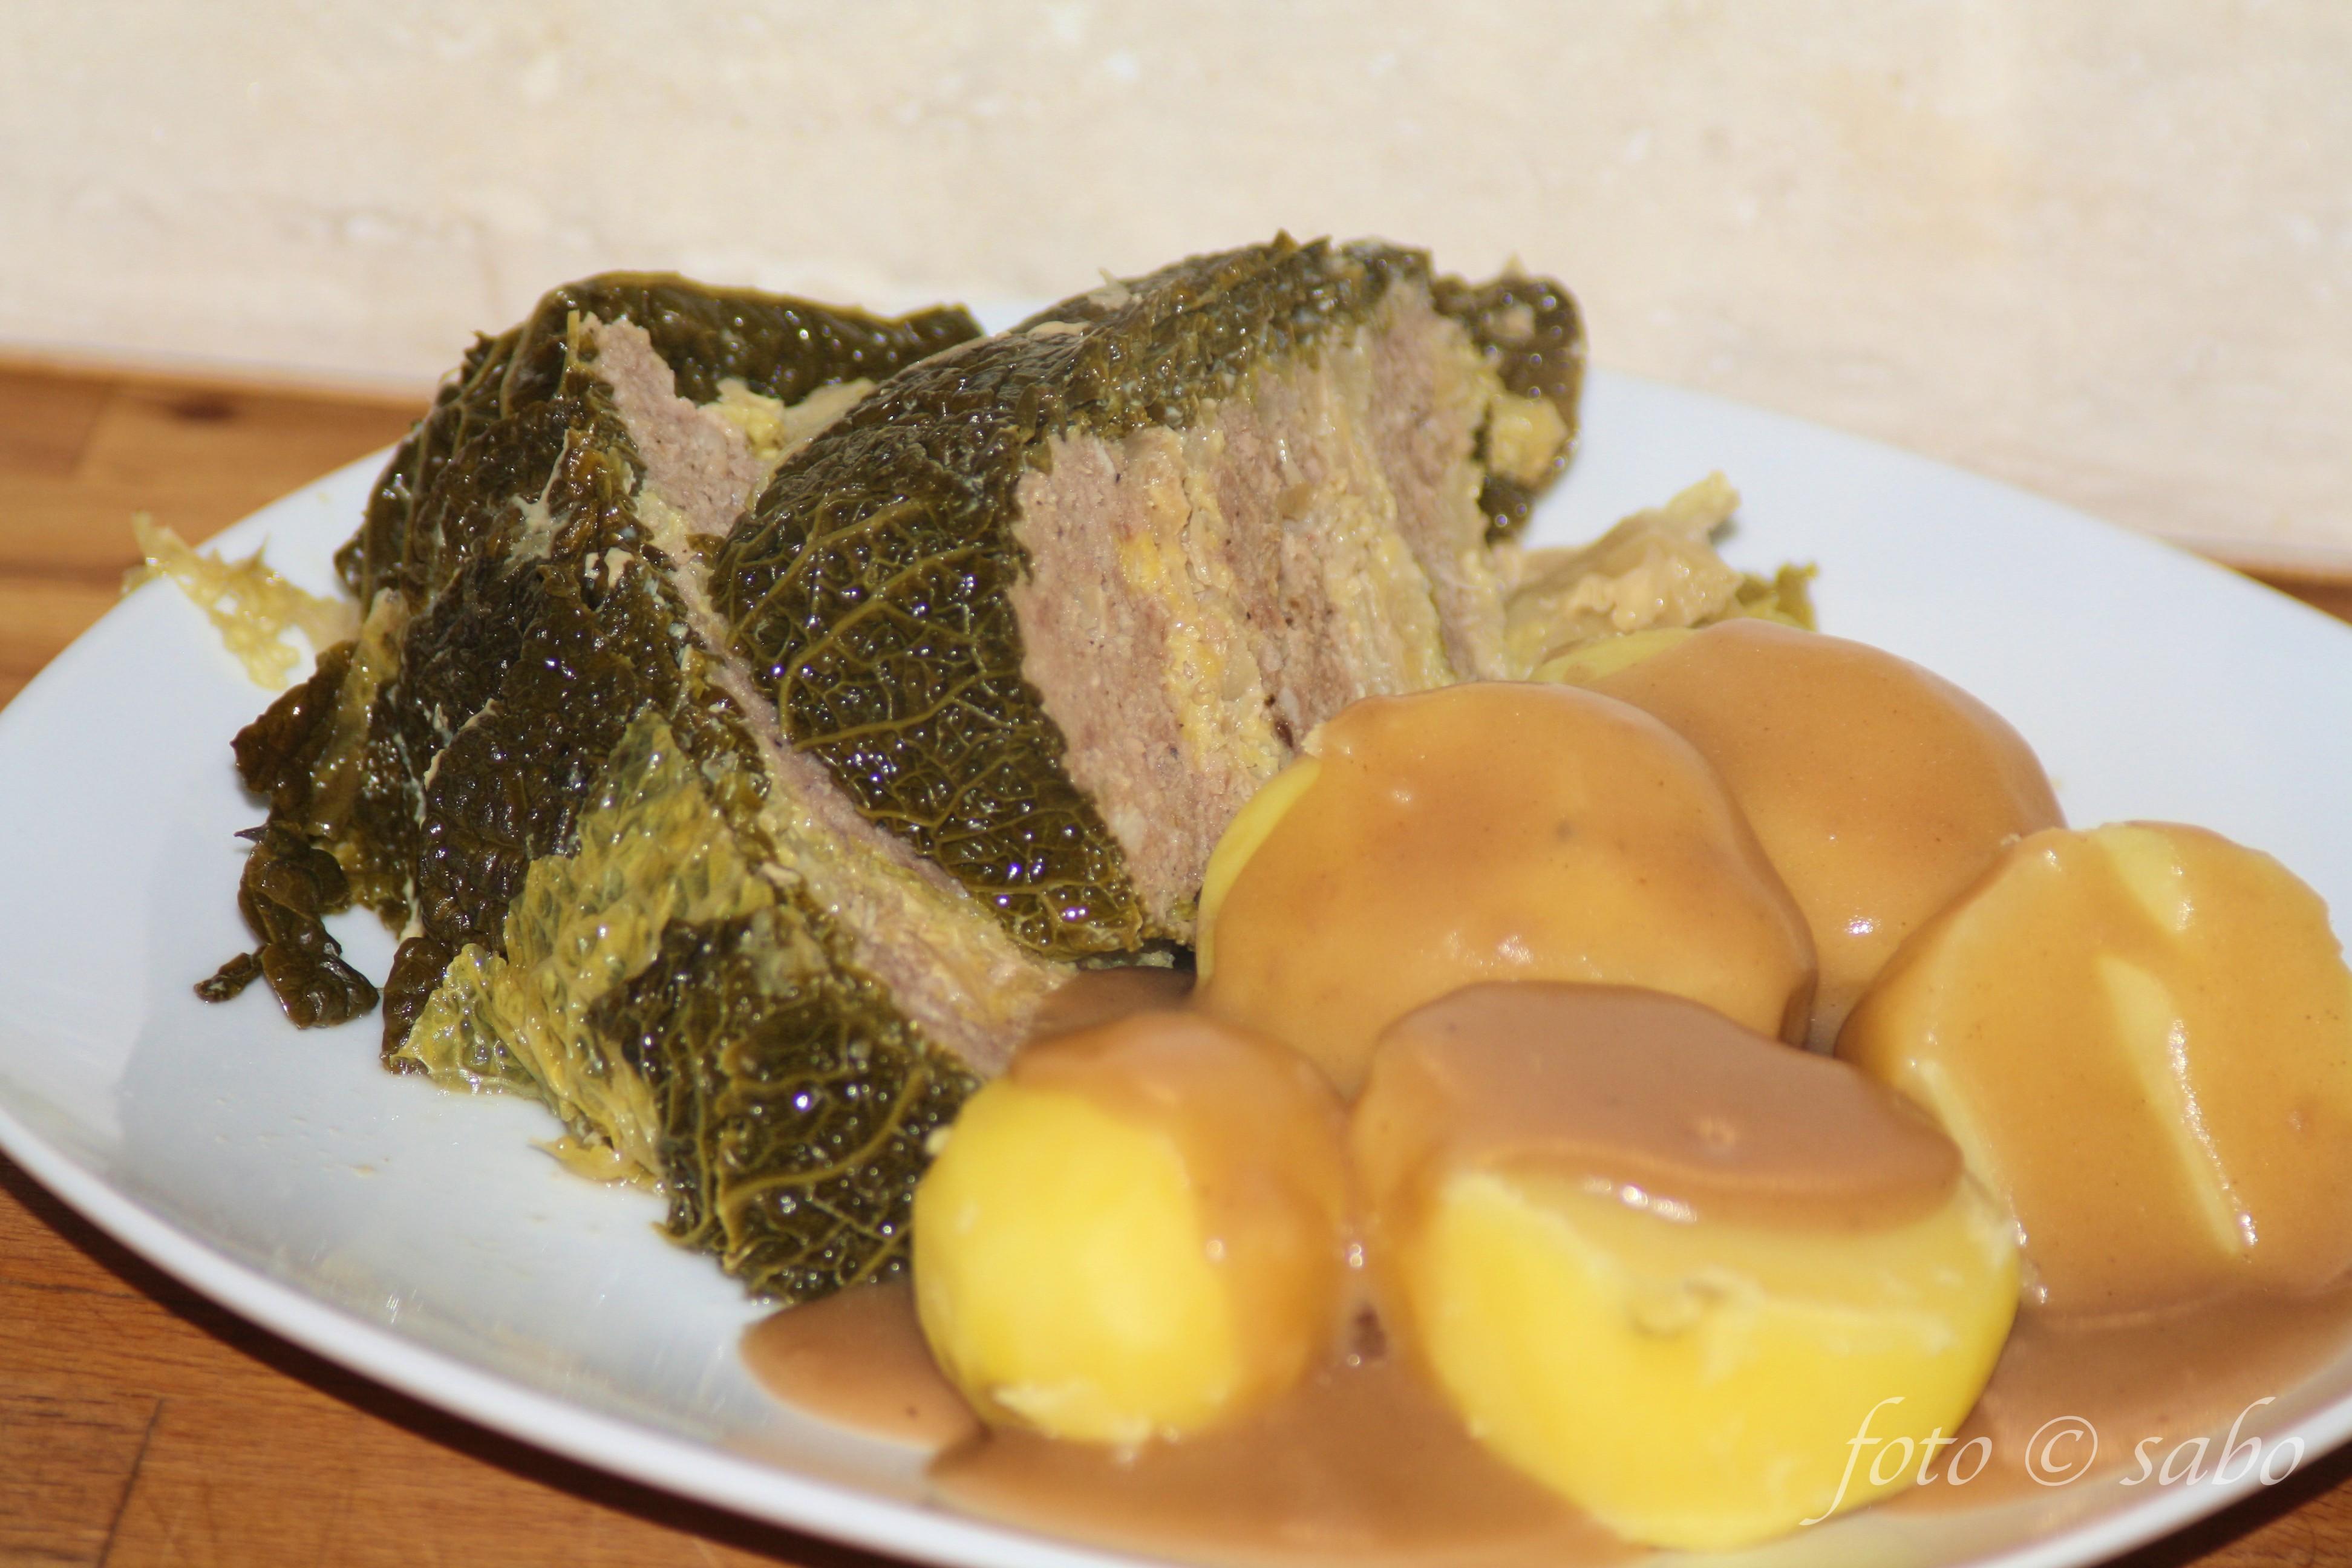 Kohlpudding mit Wirsingkohl aus dem Instant Pot